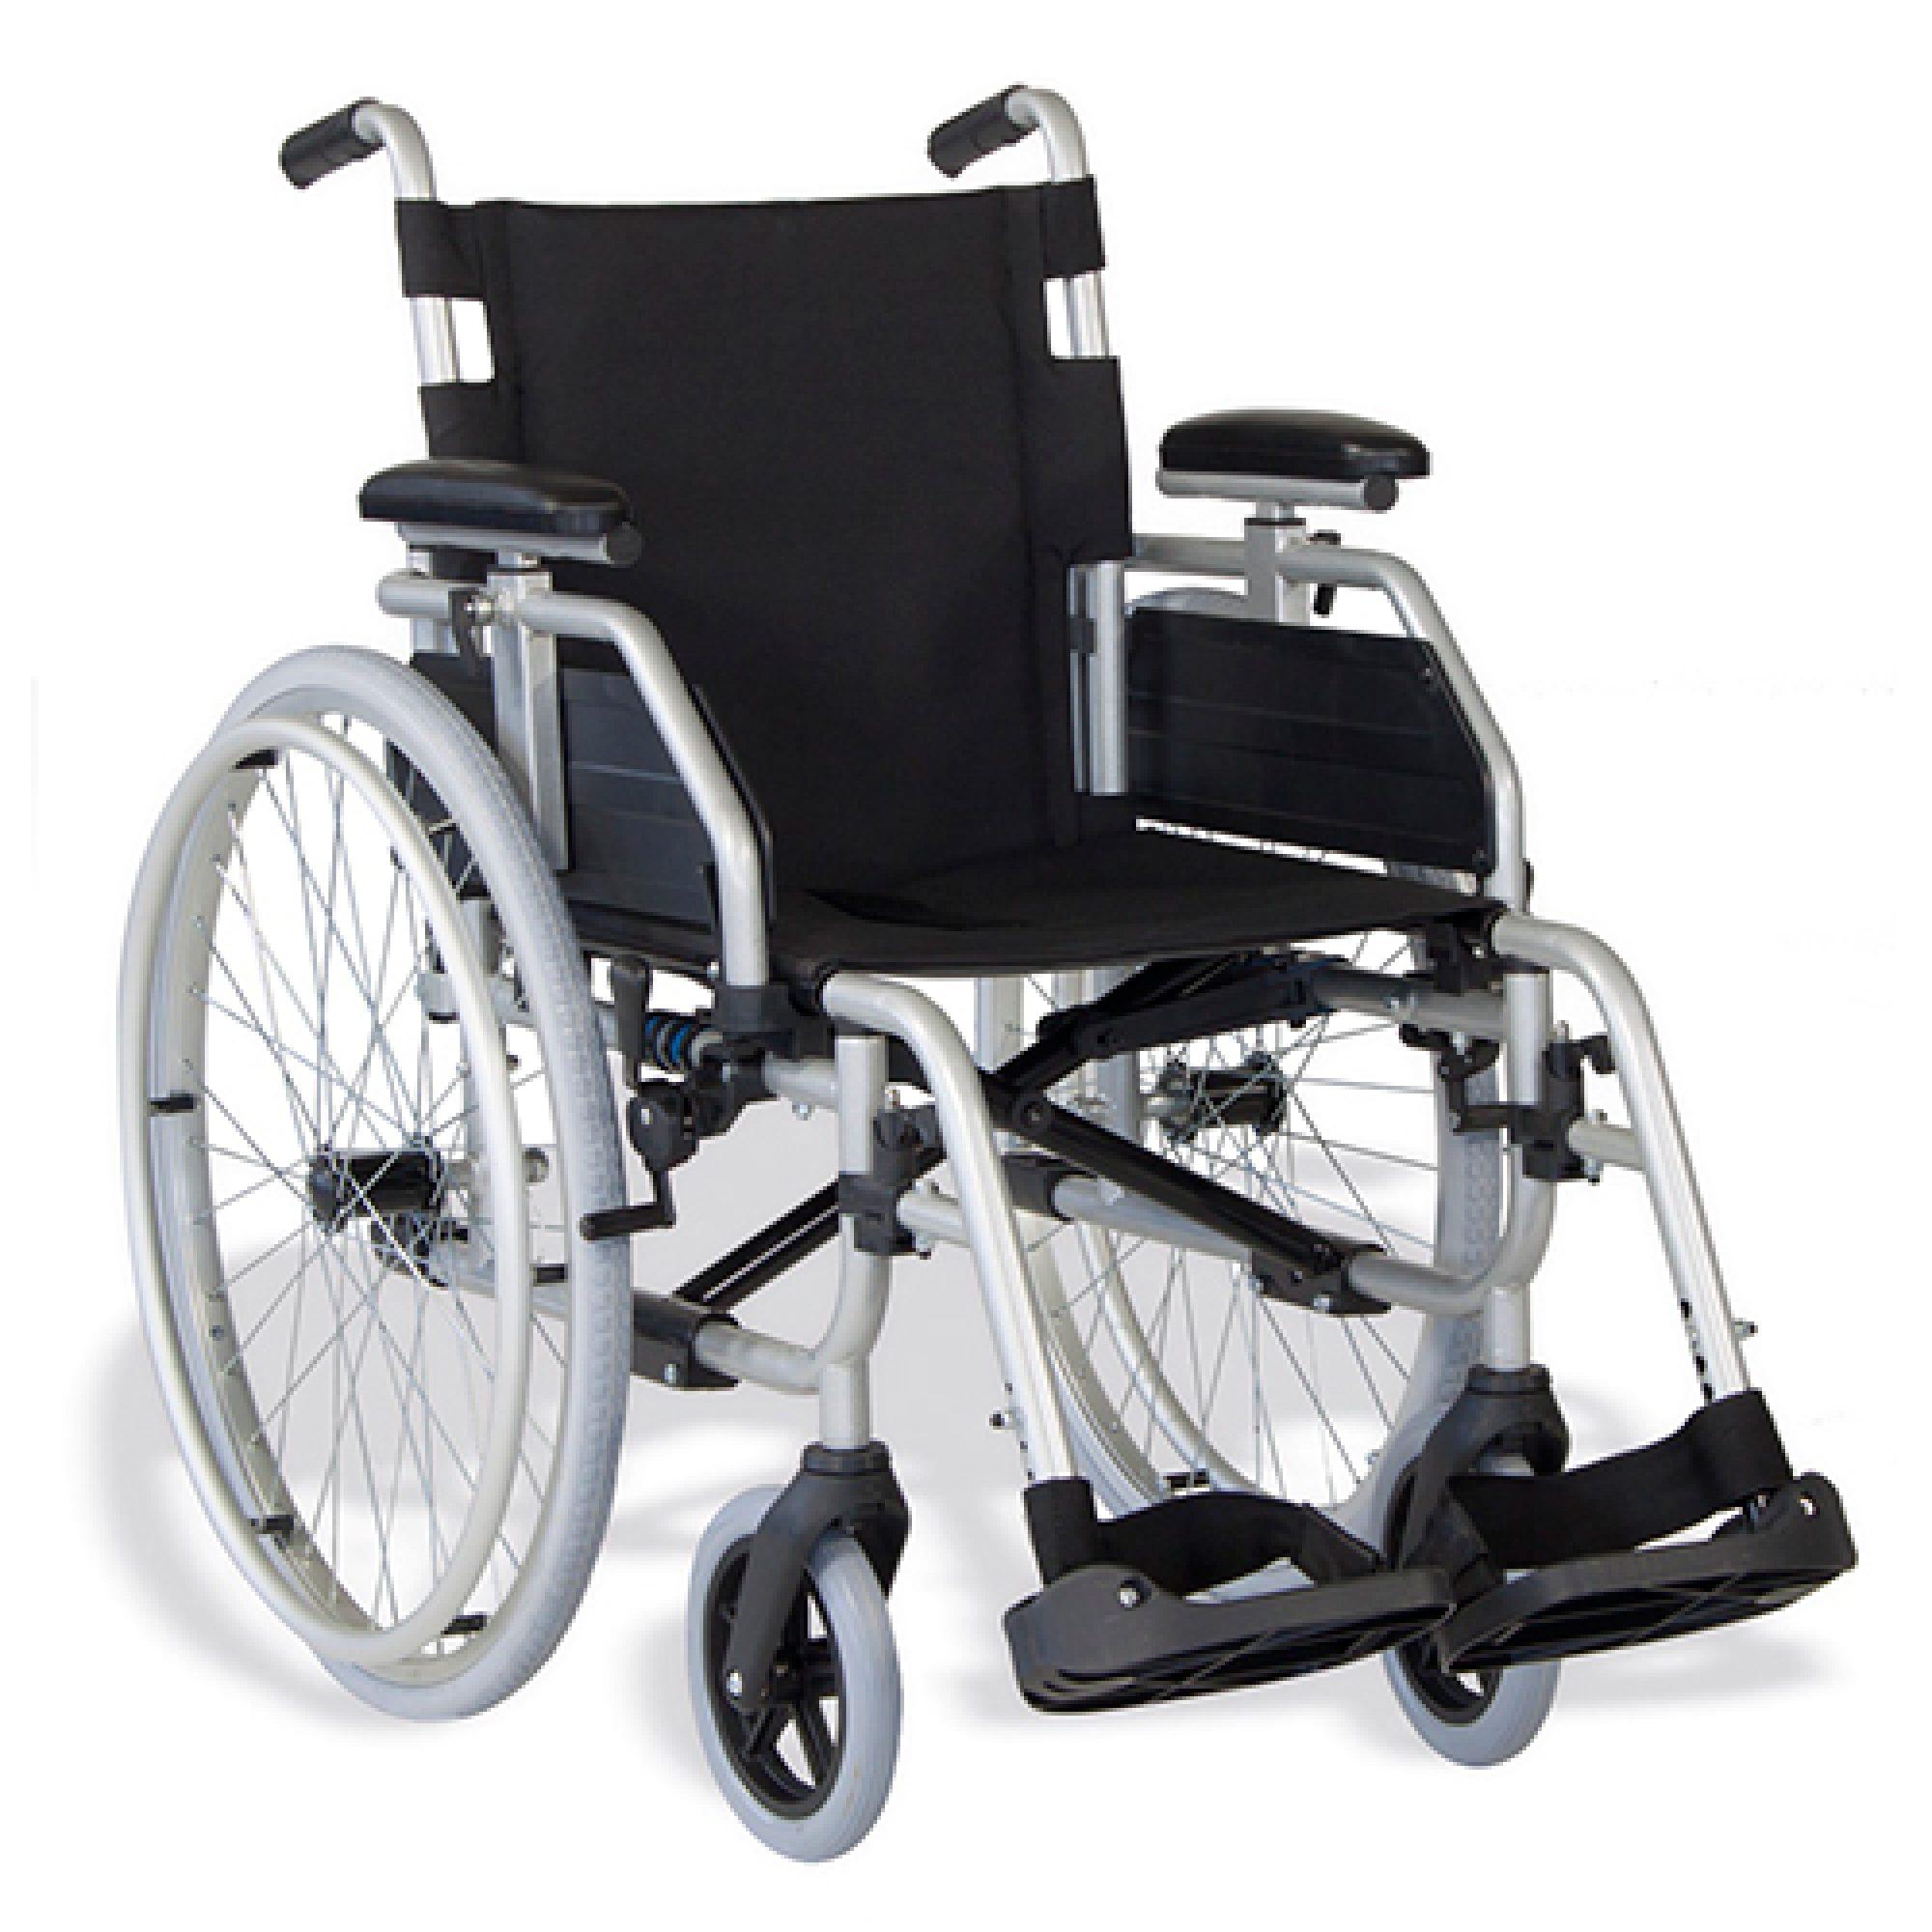 comprar silla de ruedas